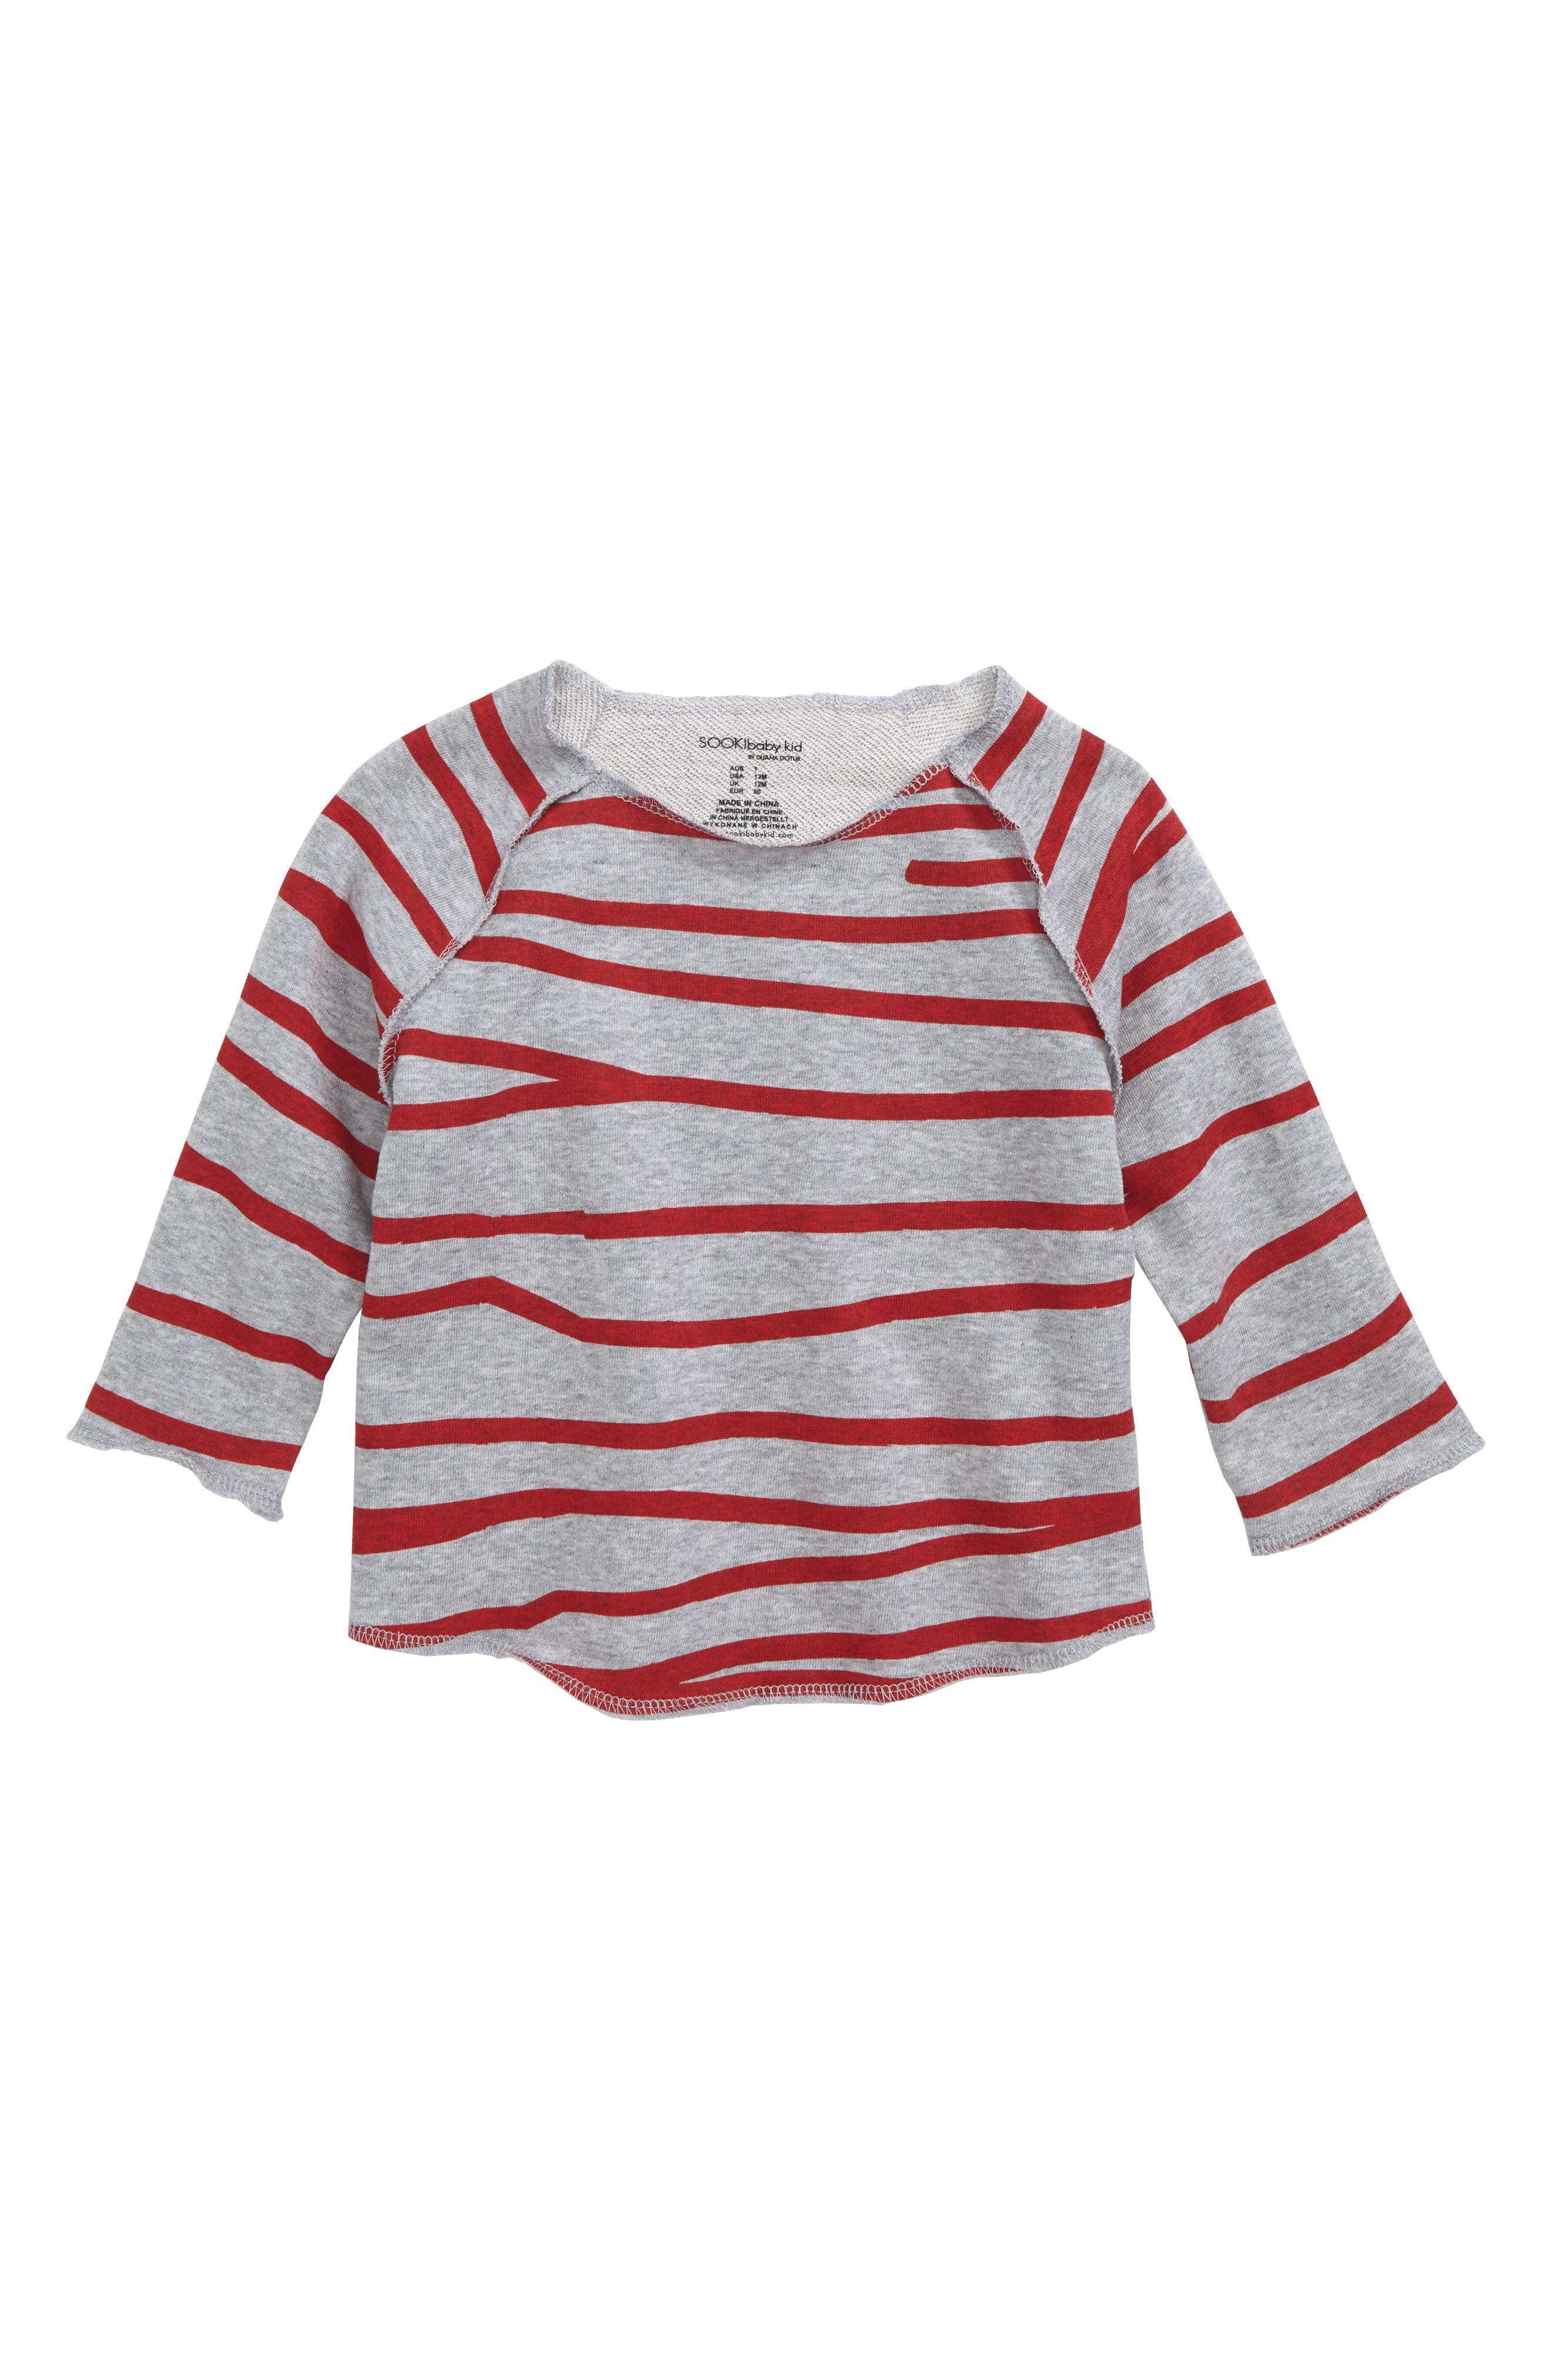 Main Image - SOOKIbaby Stripe Shirt (Baby)